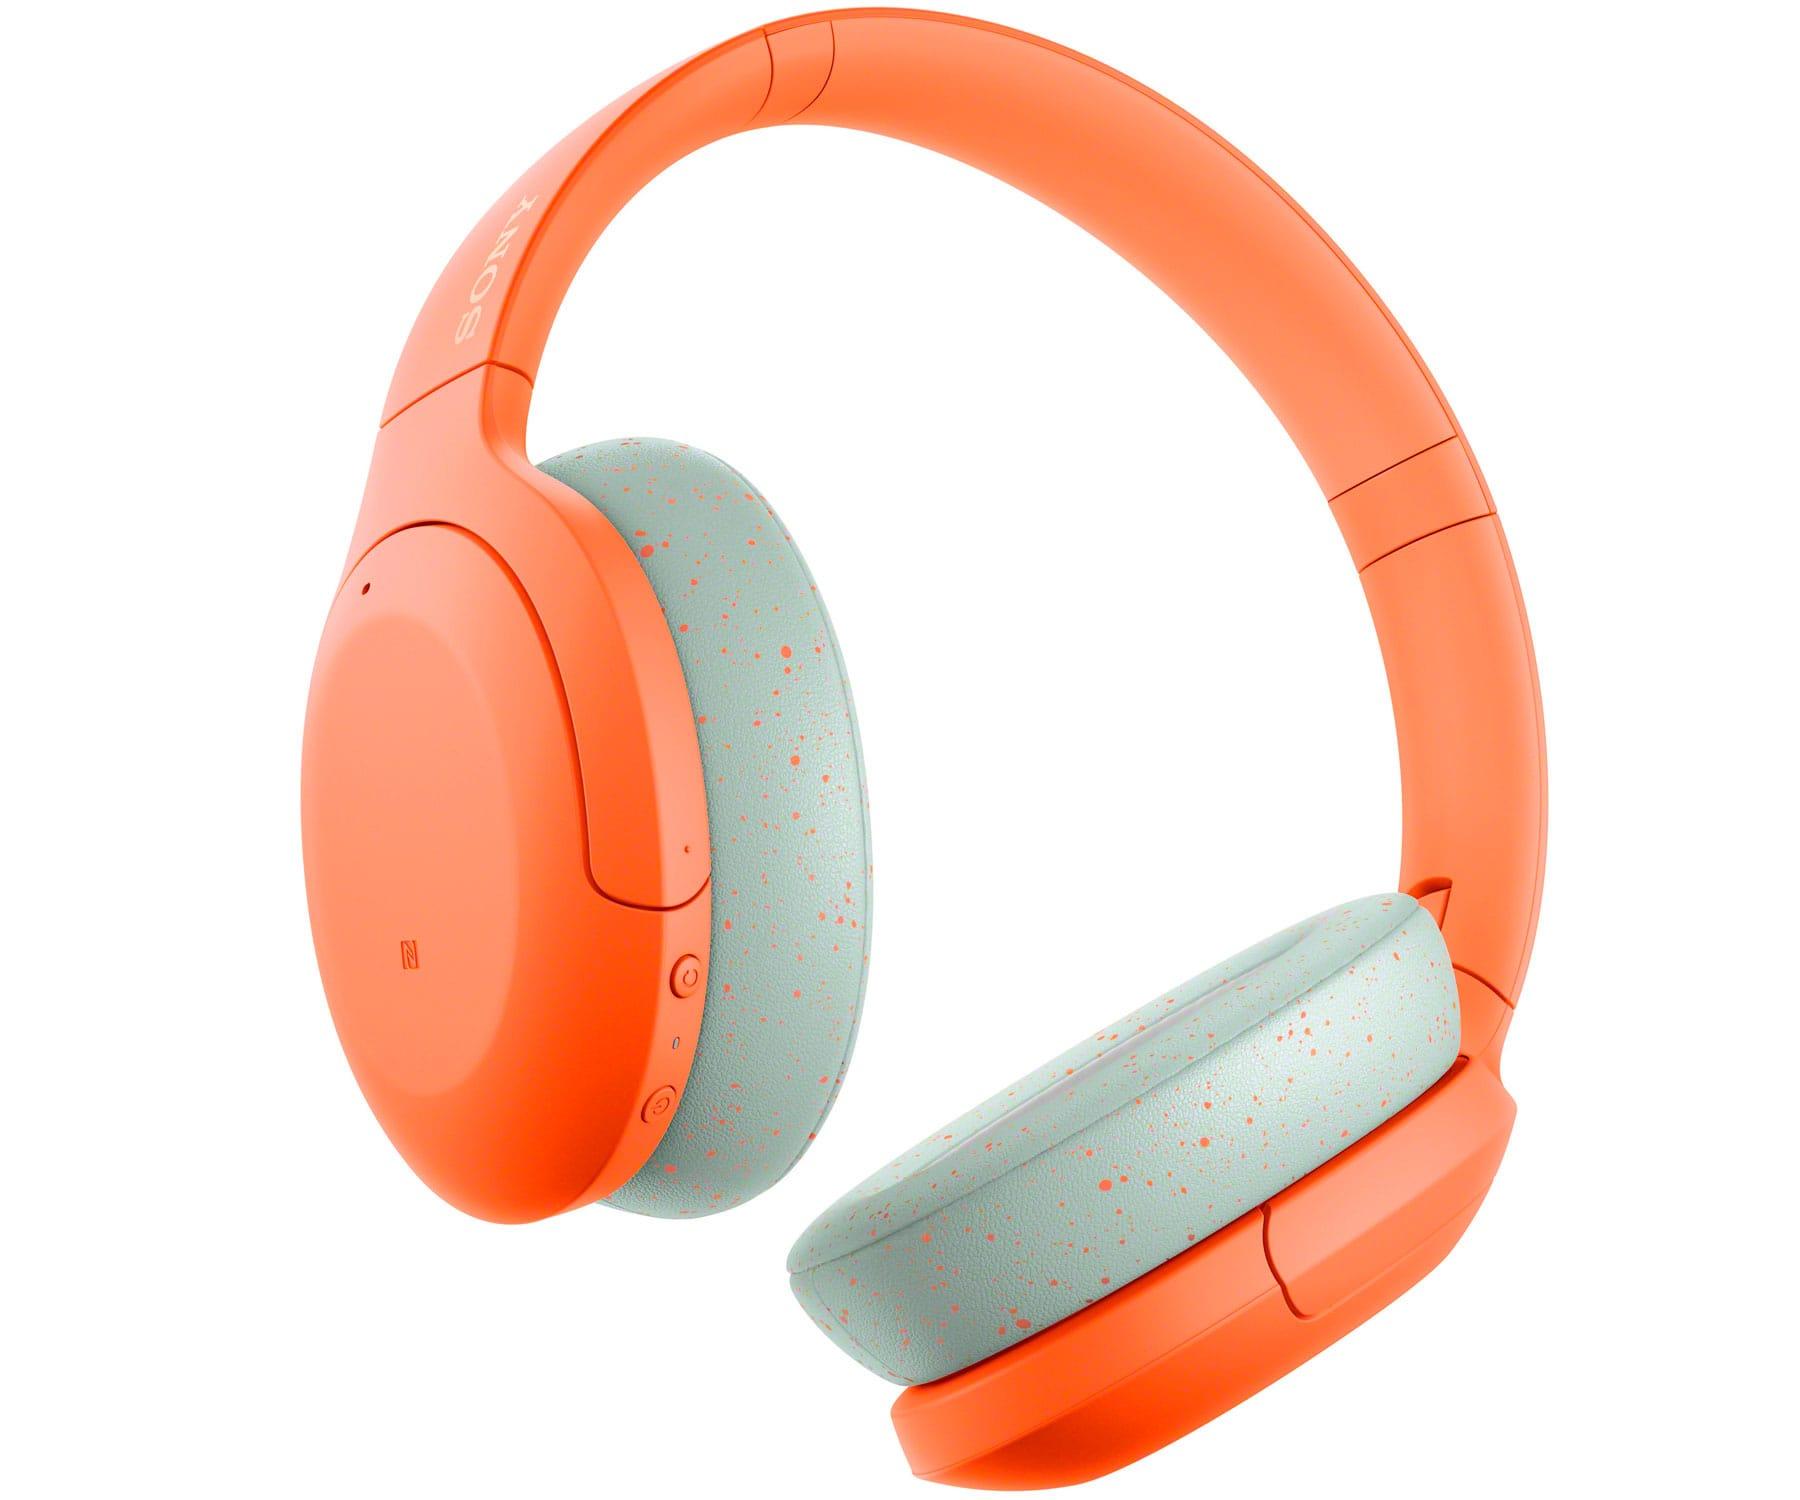 SONY WH-H910N NARANJA AURICULARES BLUETOOTH NFC NOISE CANCELLING AUDIO DE ALTA RESOLUCIÓN